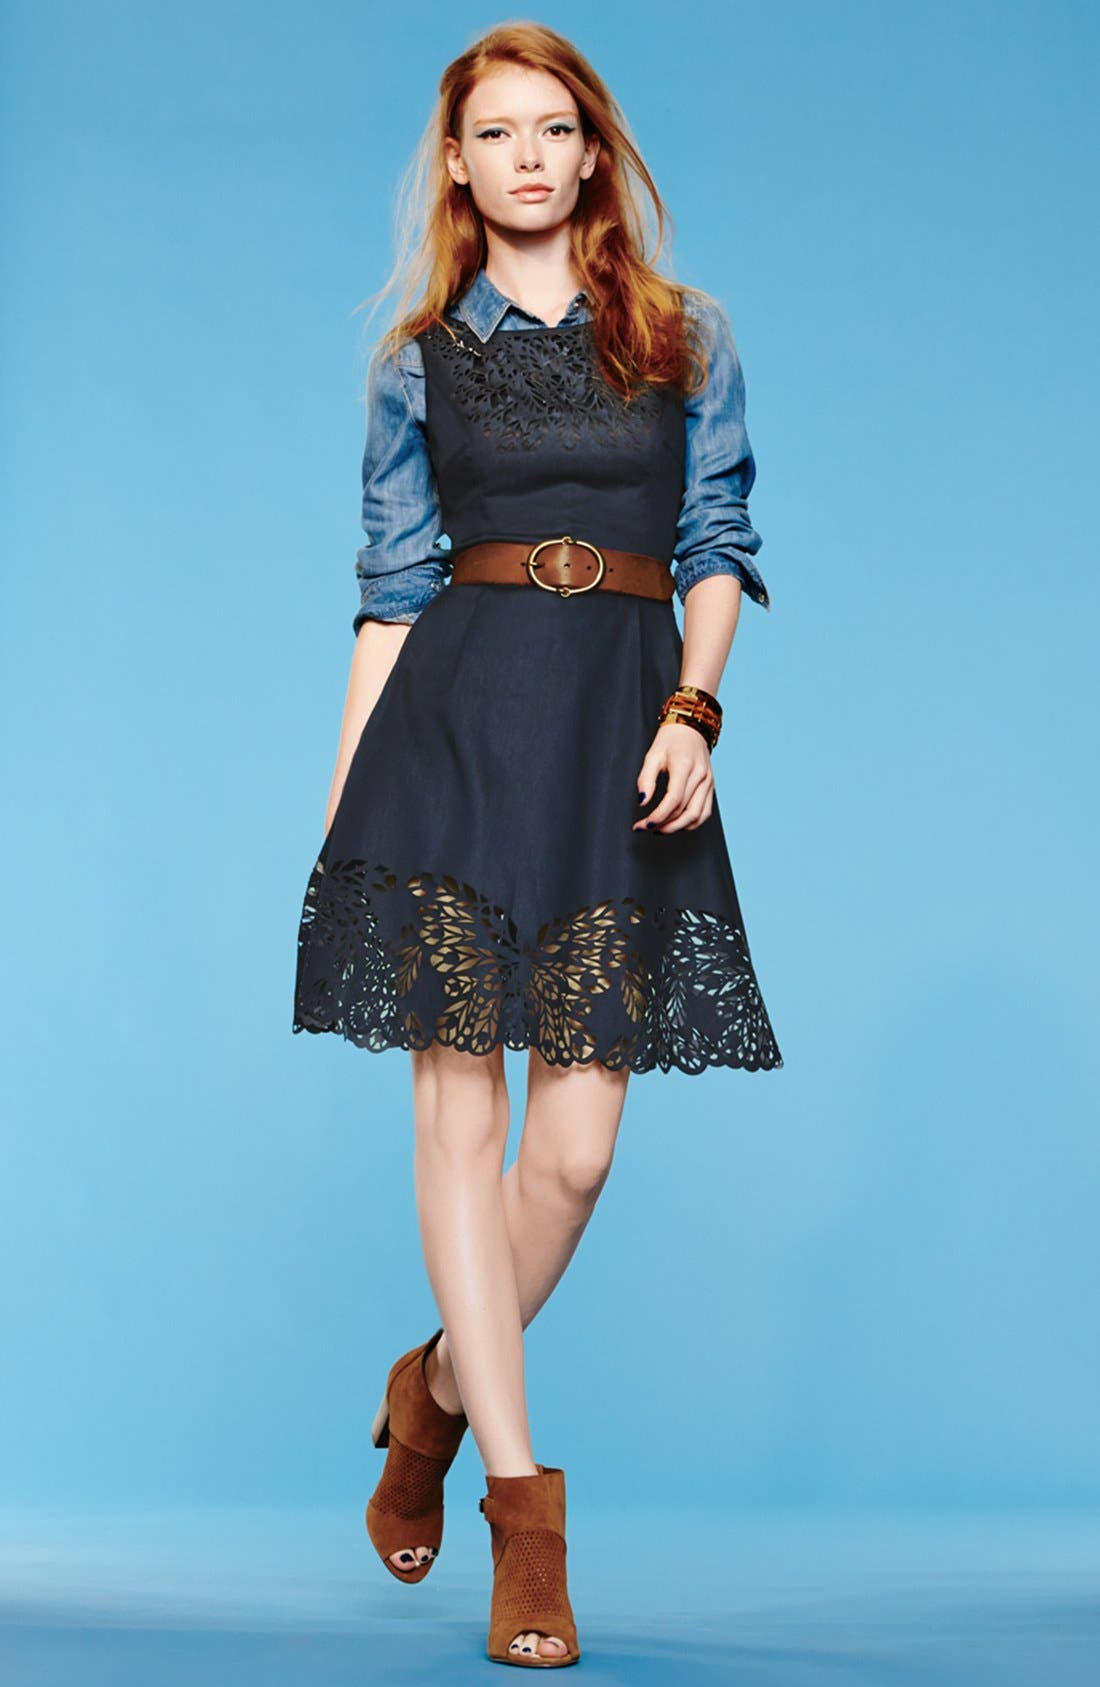 Main Image - Betsey Johnson Dress, Paige Denim Shirt & Accessories